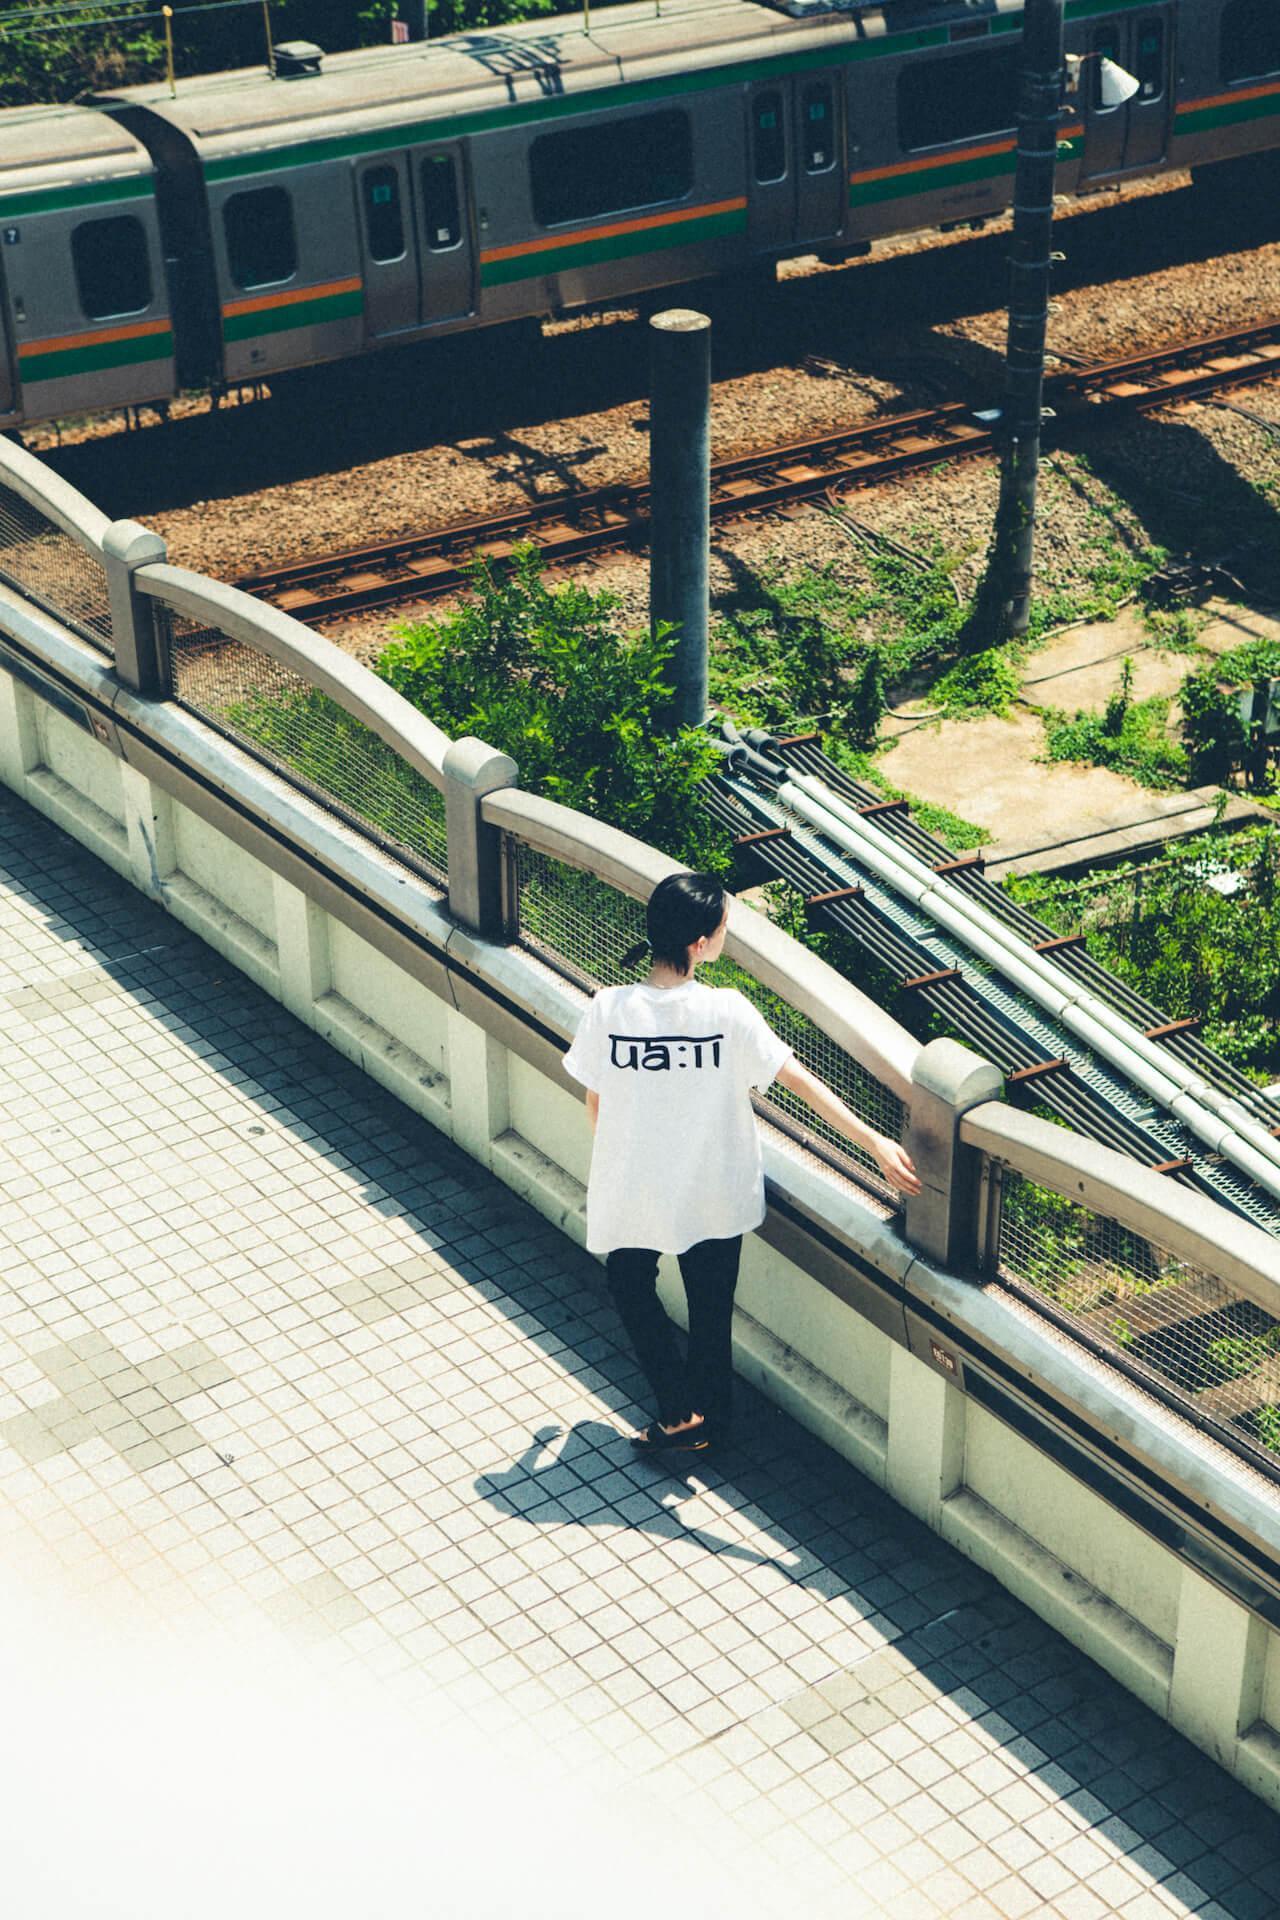 UA × Journal StandardのコラボTシャツが6月25日より店舗販売開始|美衣がモデルを務めるビジュアルも公開に life_fashion210611-ua-journalstandard-5